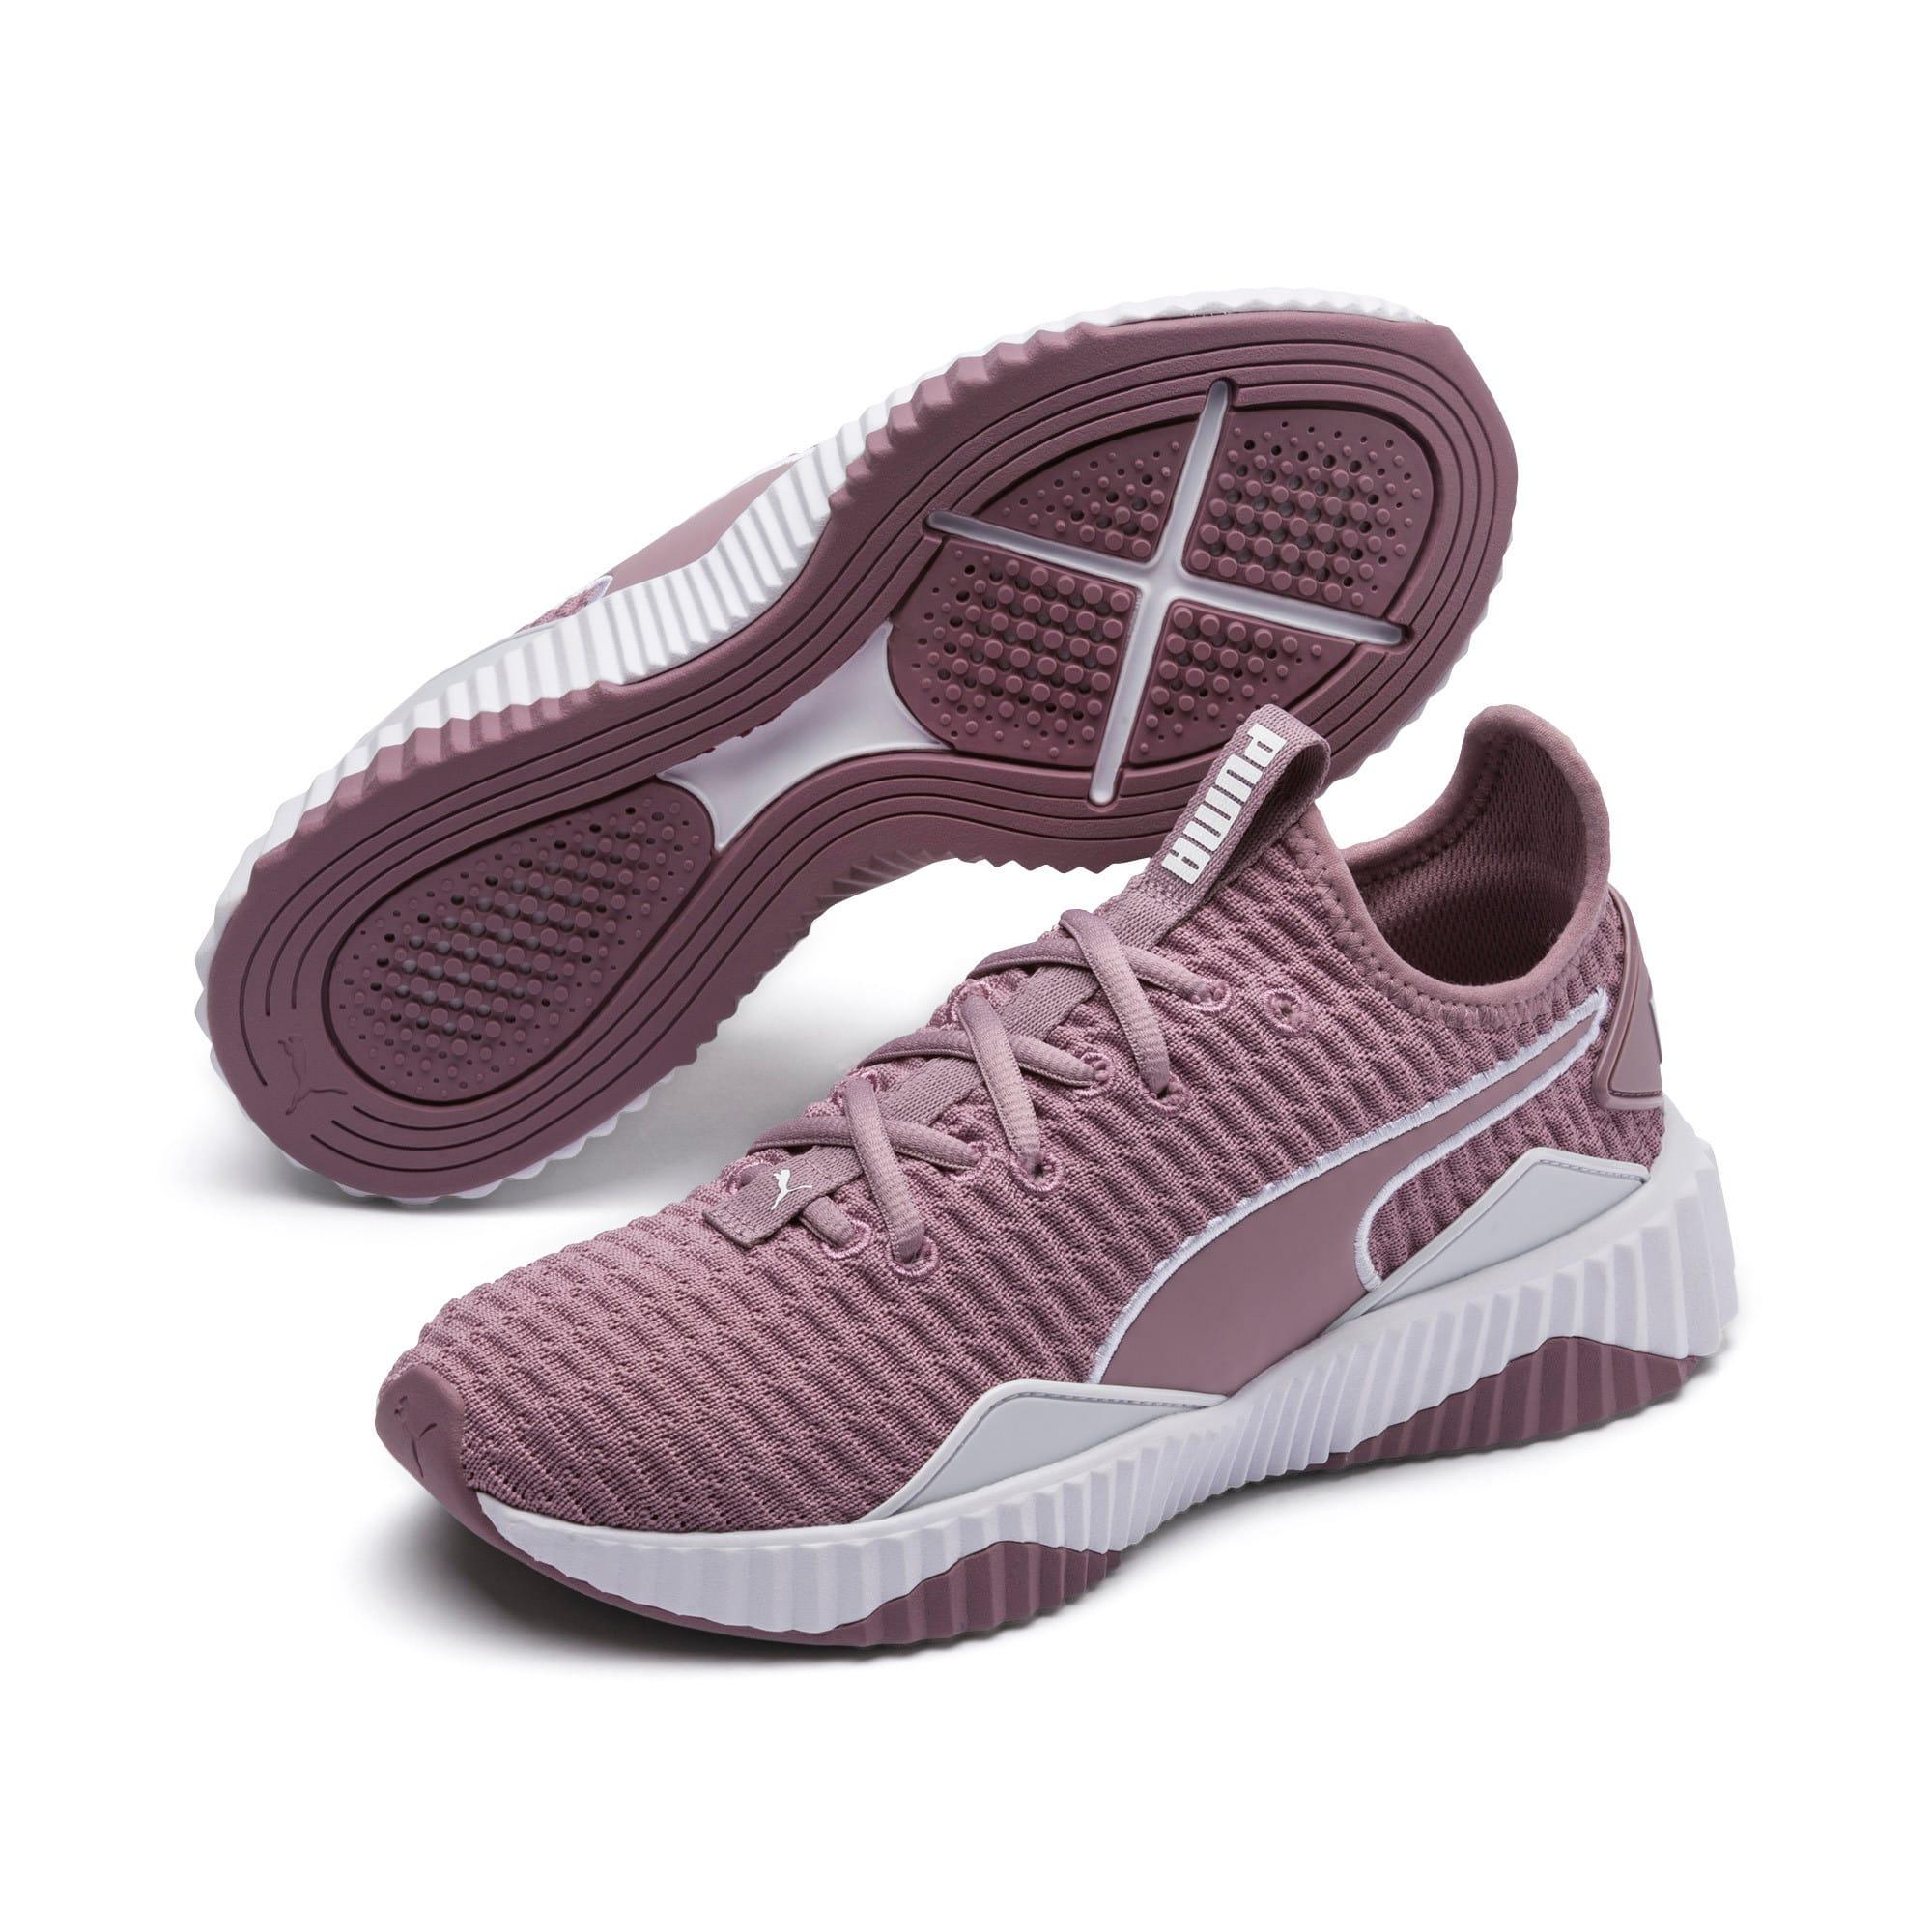 Thumbnail 2 of Defy Women's Training Shoes, Elderberry-Puma White, medium